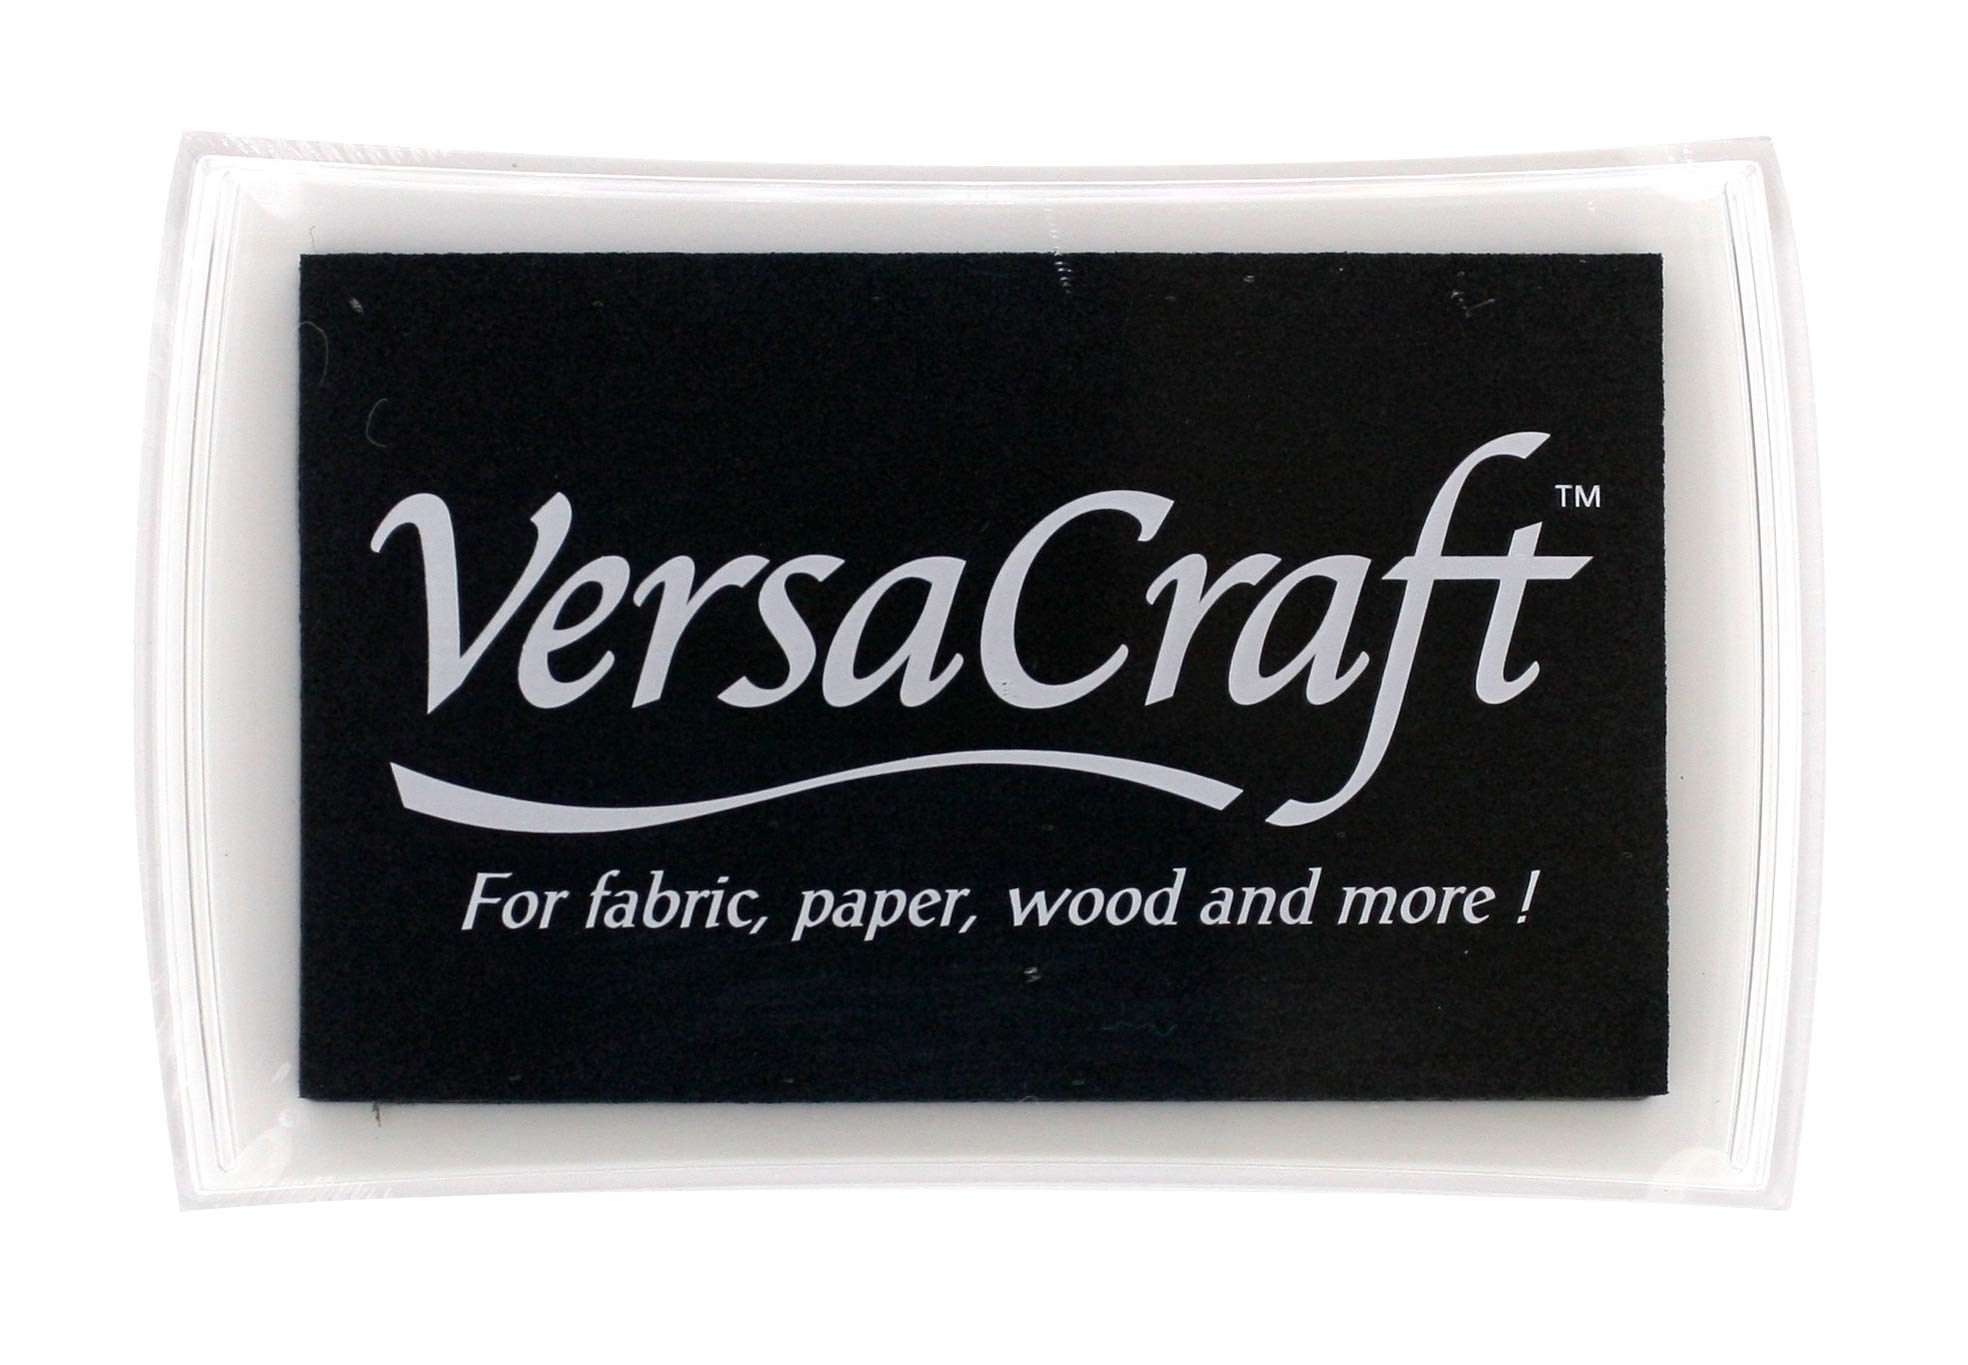 Versacraft vks-114/Poppy Red 25/x 25/mm Small Fabric Cube Inkpad